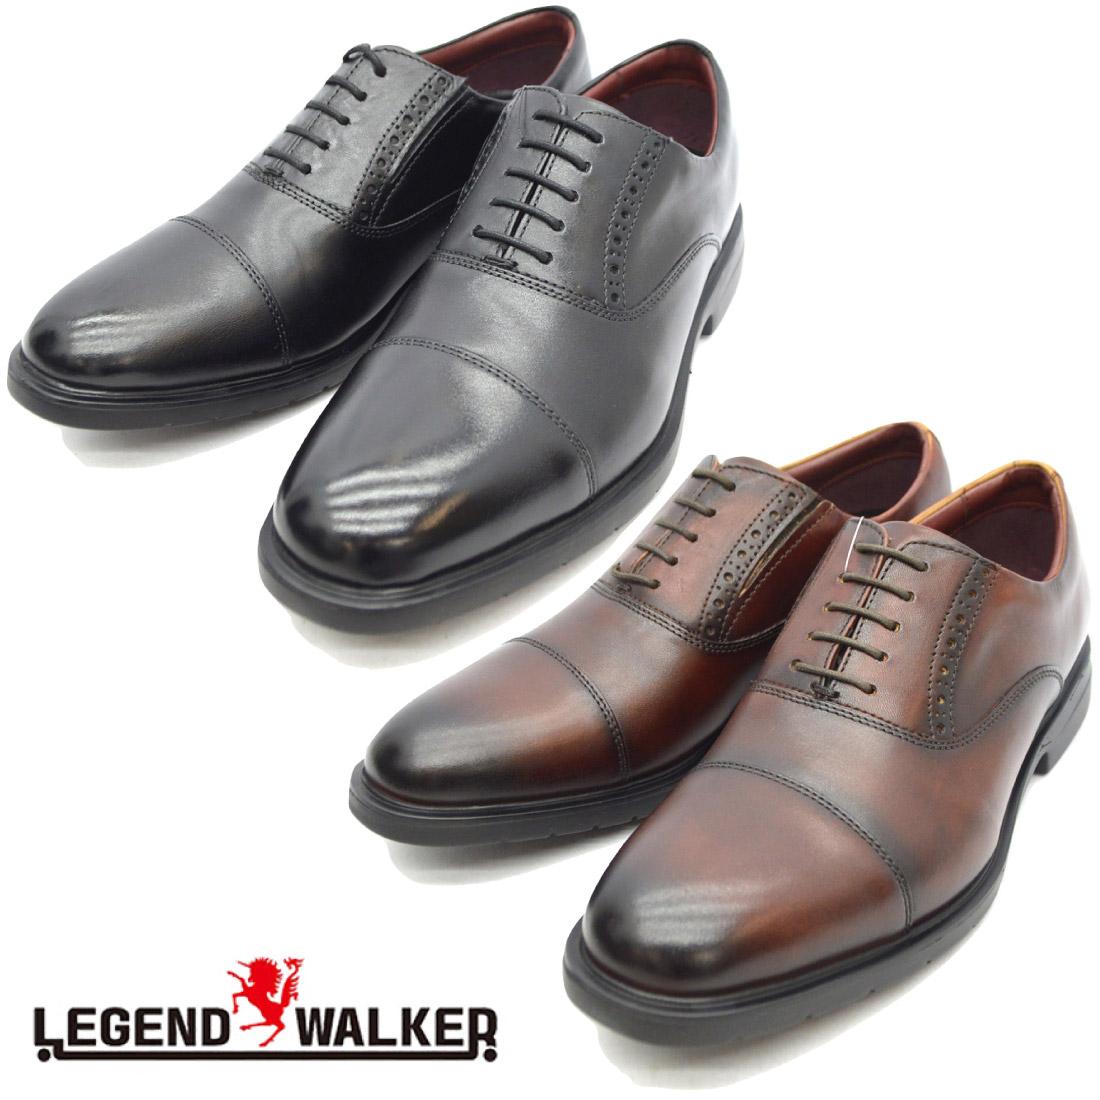 Legend Walker レジェンドウォーカー ストレートチップ ビジネス シューズ LW001 【nesh】 【新品】